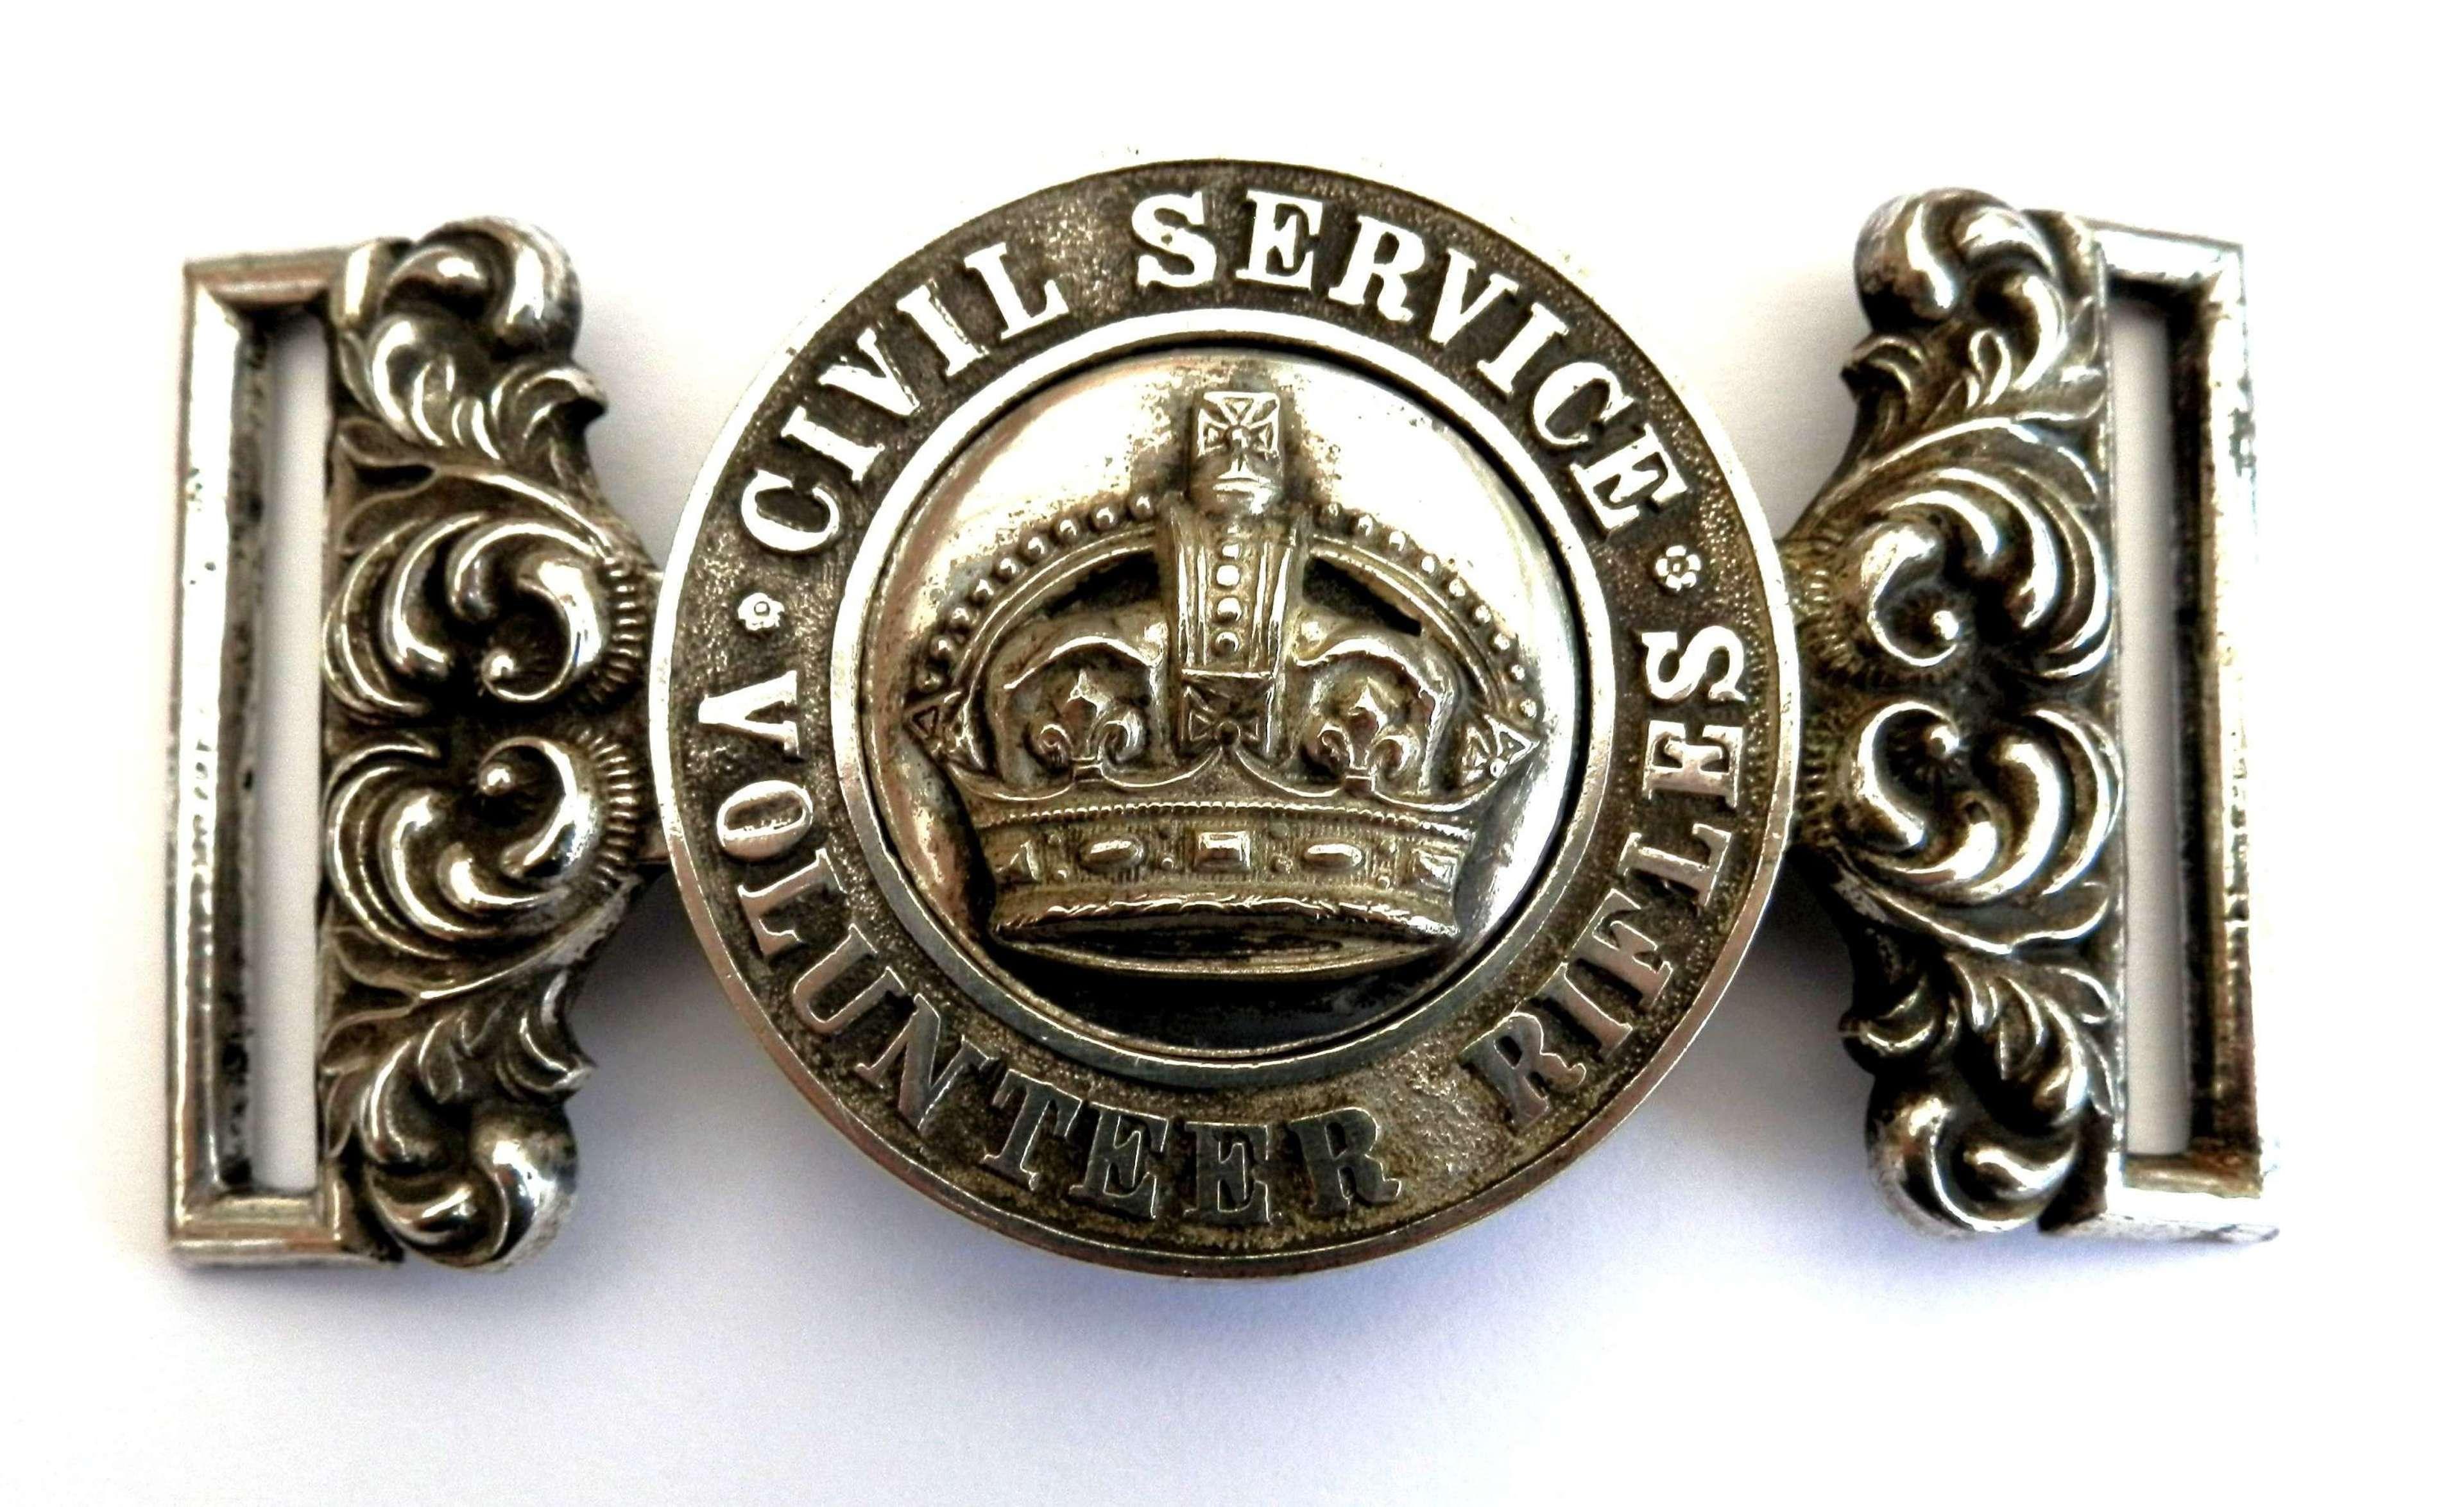 Civil Service Volunteers Waist Belt Clasp.